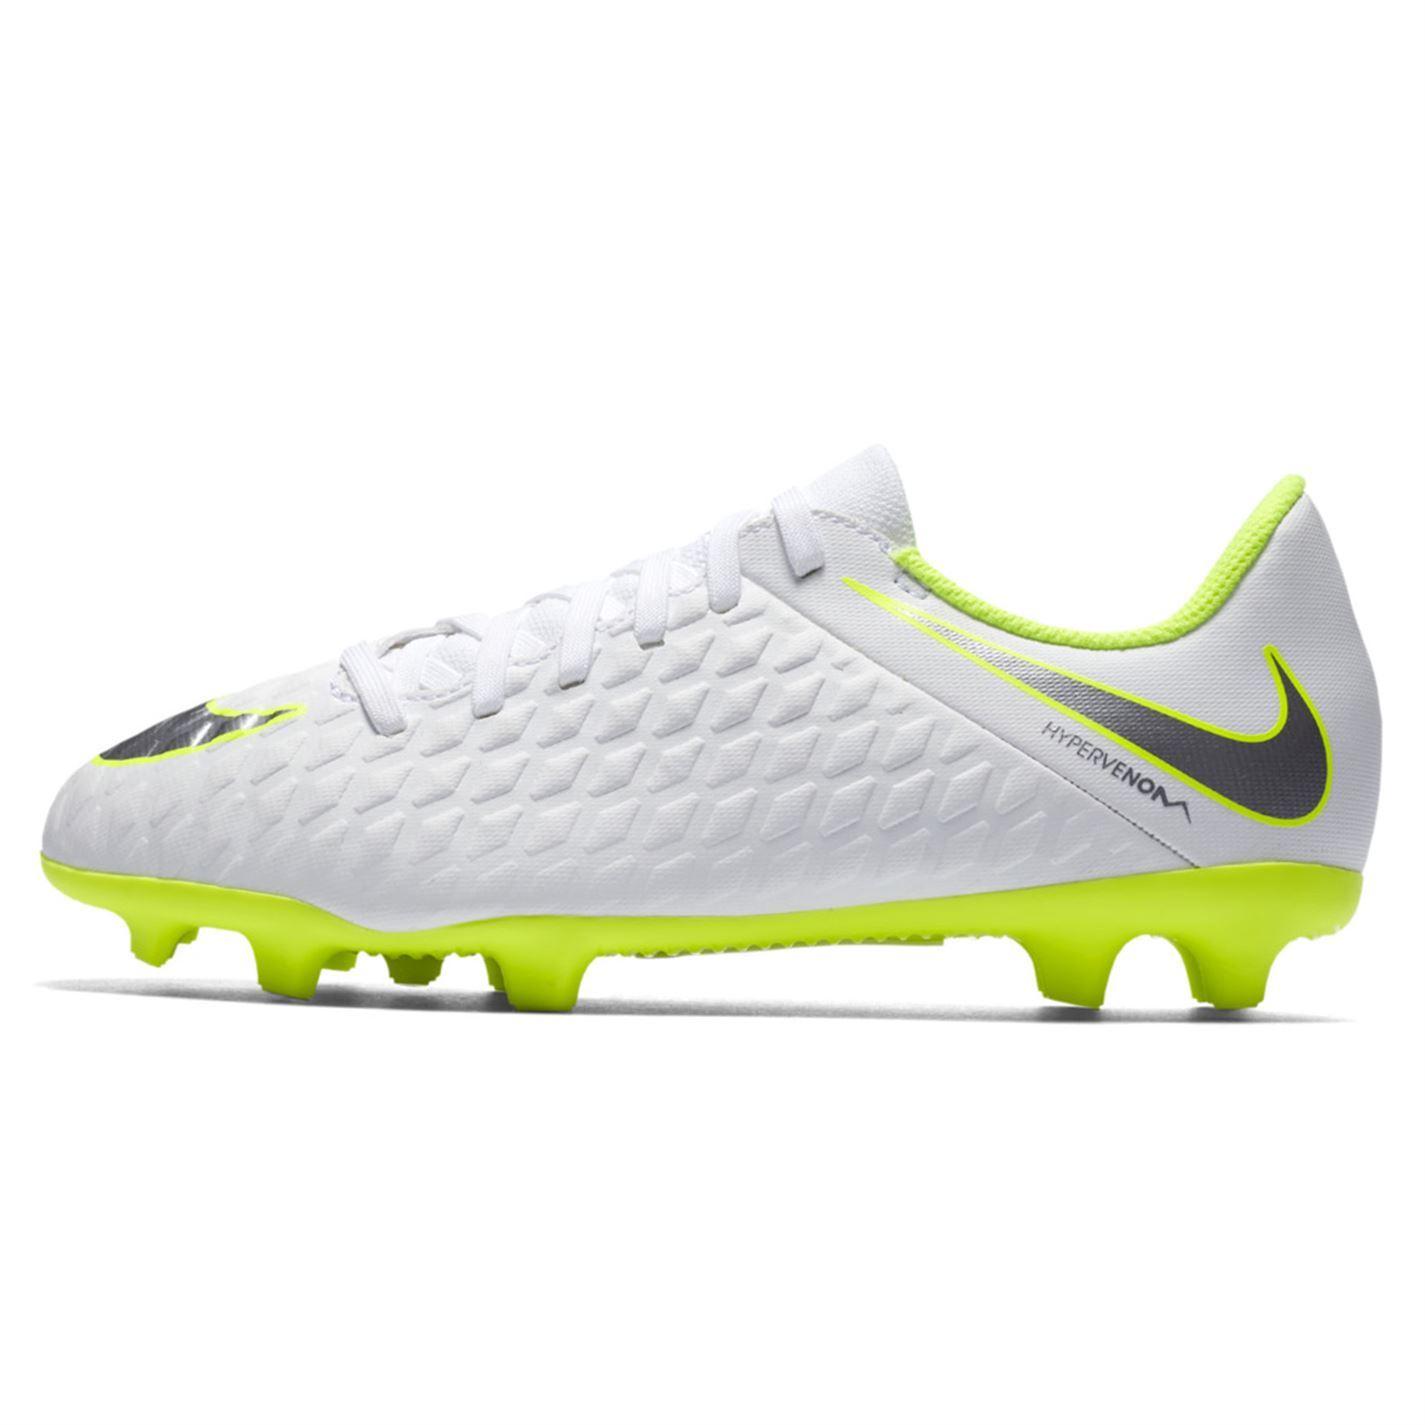 e3ea78441169 Details about Nike Hypervenom Phantom Club FG Football Boots Juniors White  Soccer Shoes Cleats